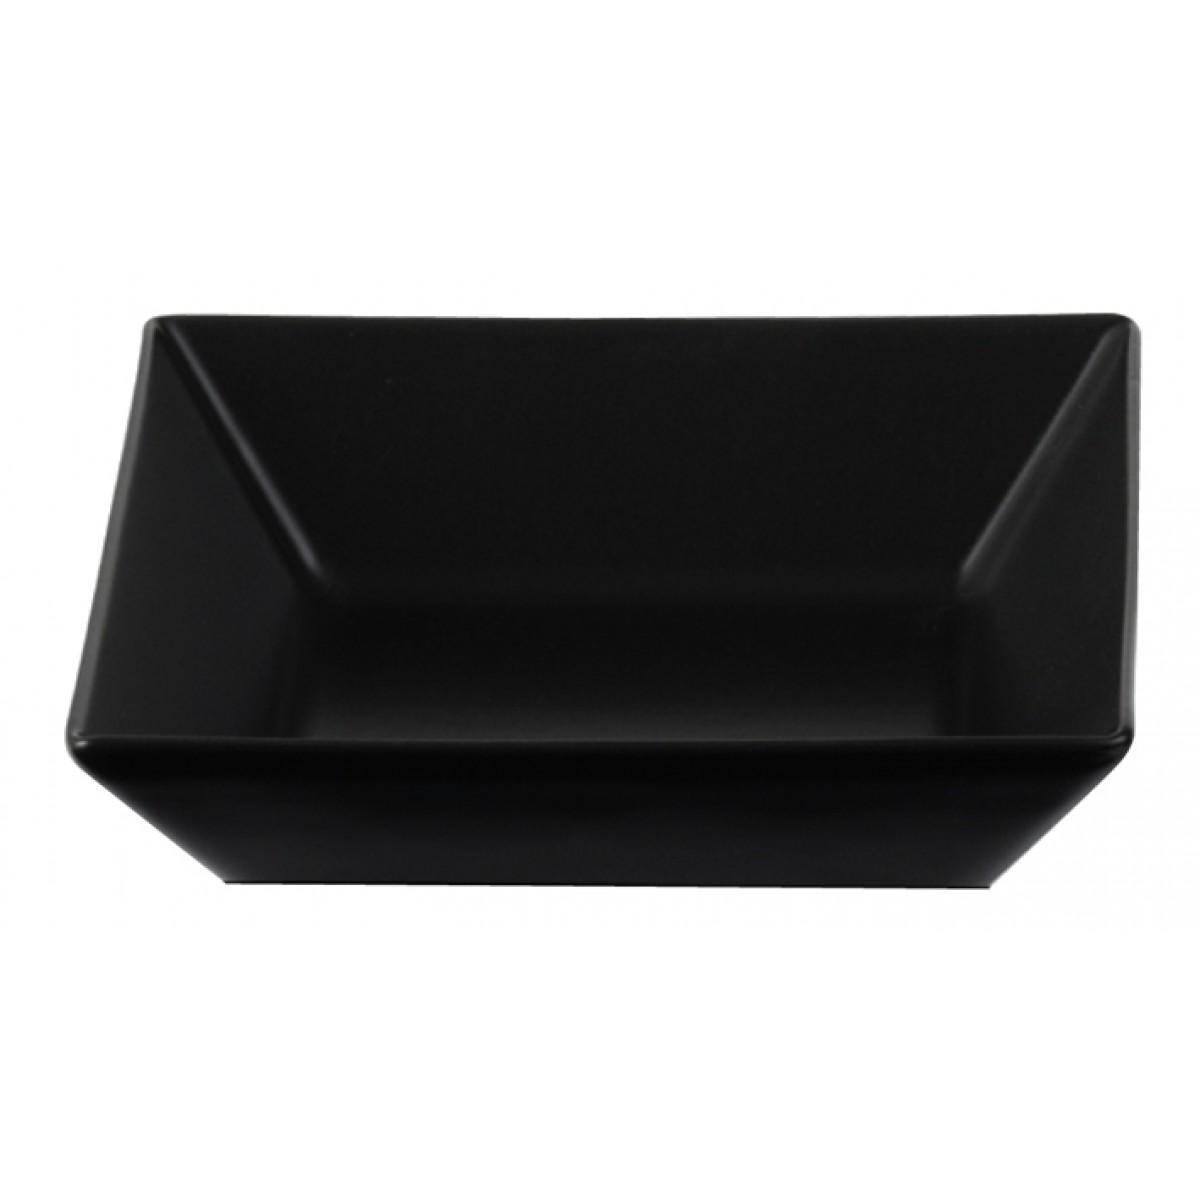 AIDA Quadro skål mat sort 17,5 x 17,5 cm